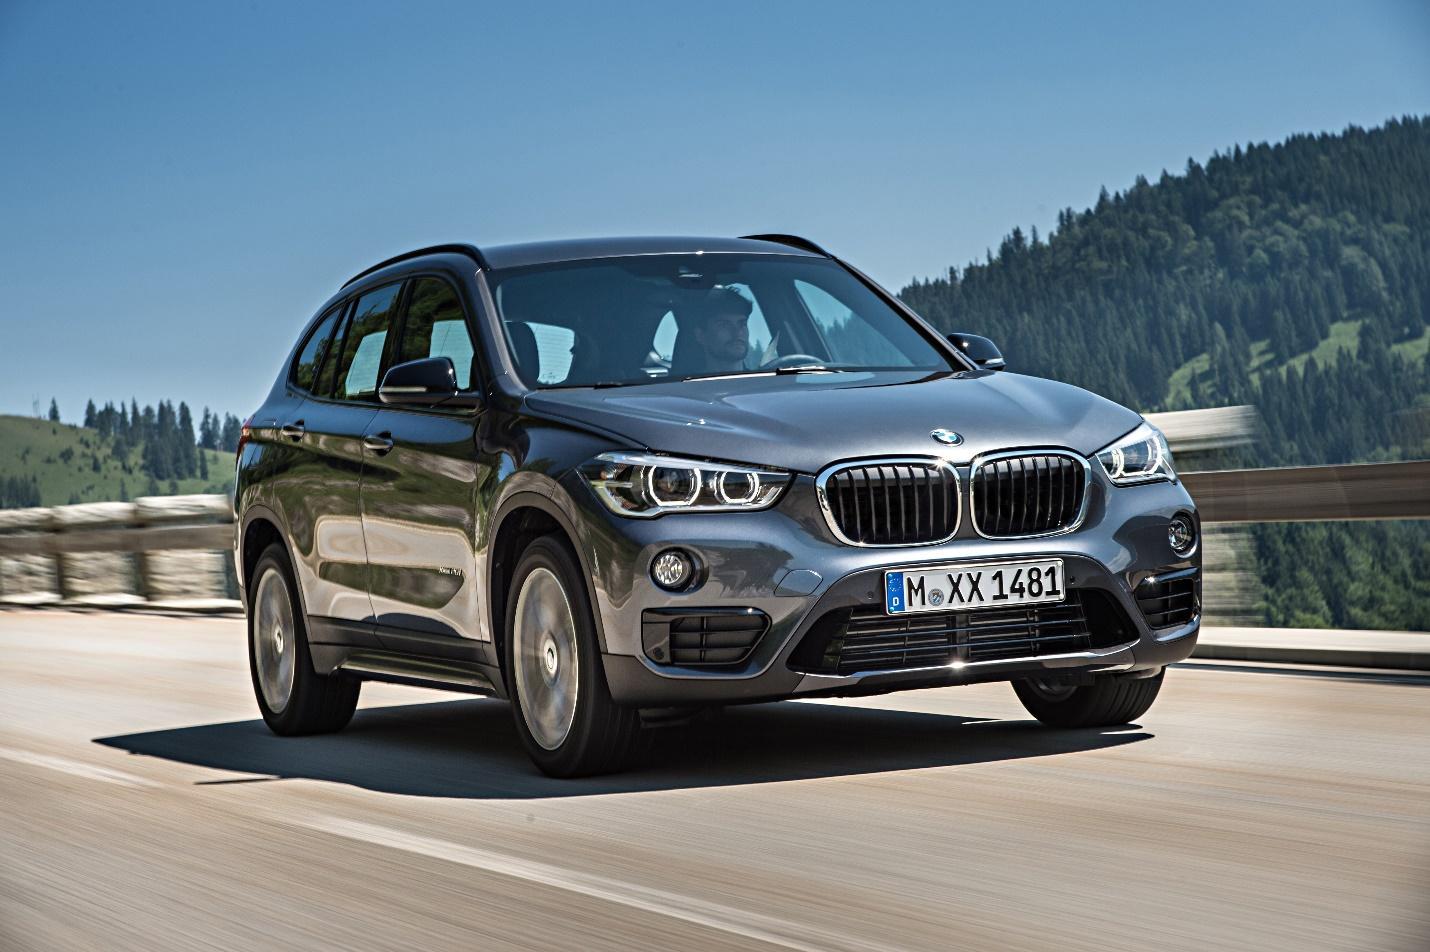 http://s3.caradvice.com.au/wp-content/uploads/2015/07/BMW-X1-xDrive25i-009.jpg